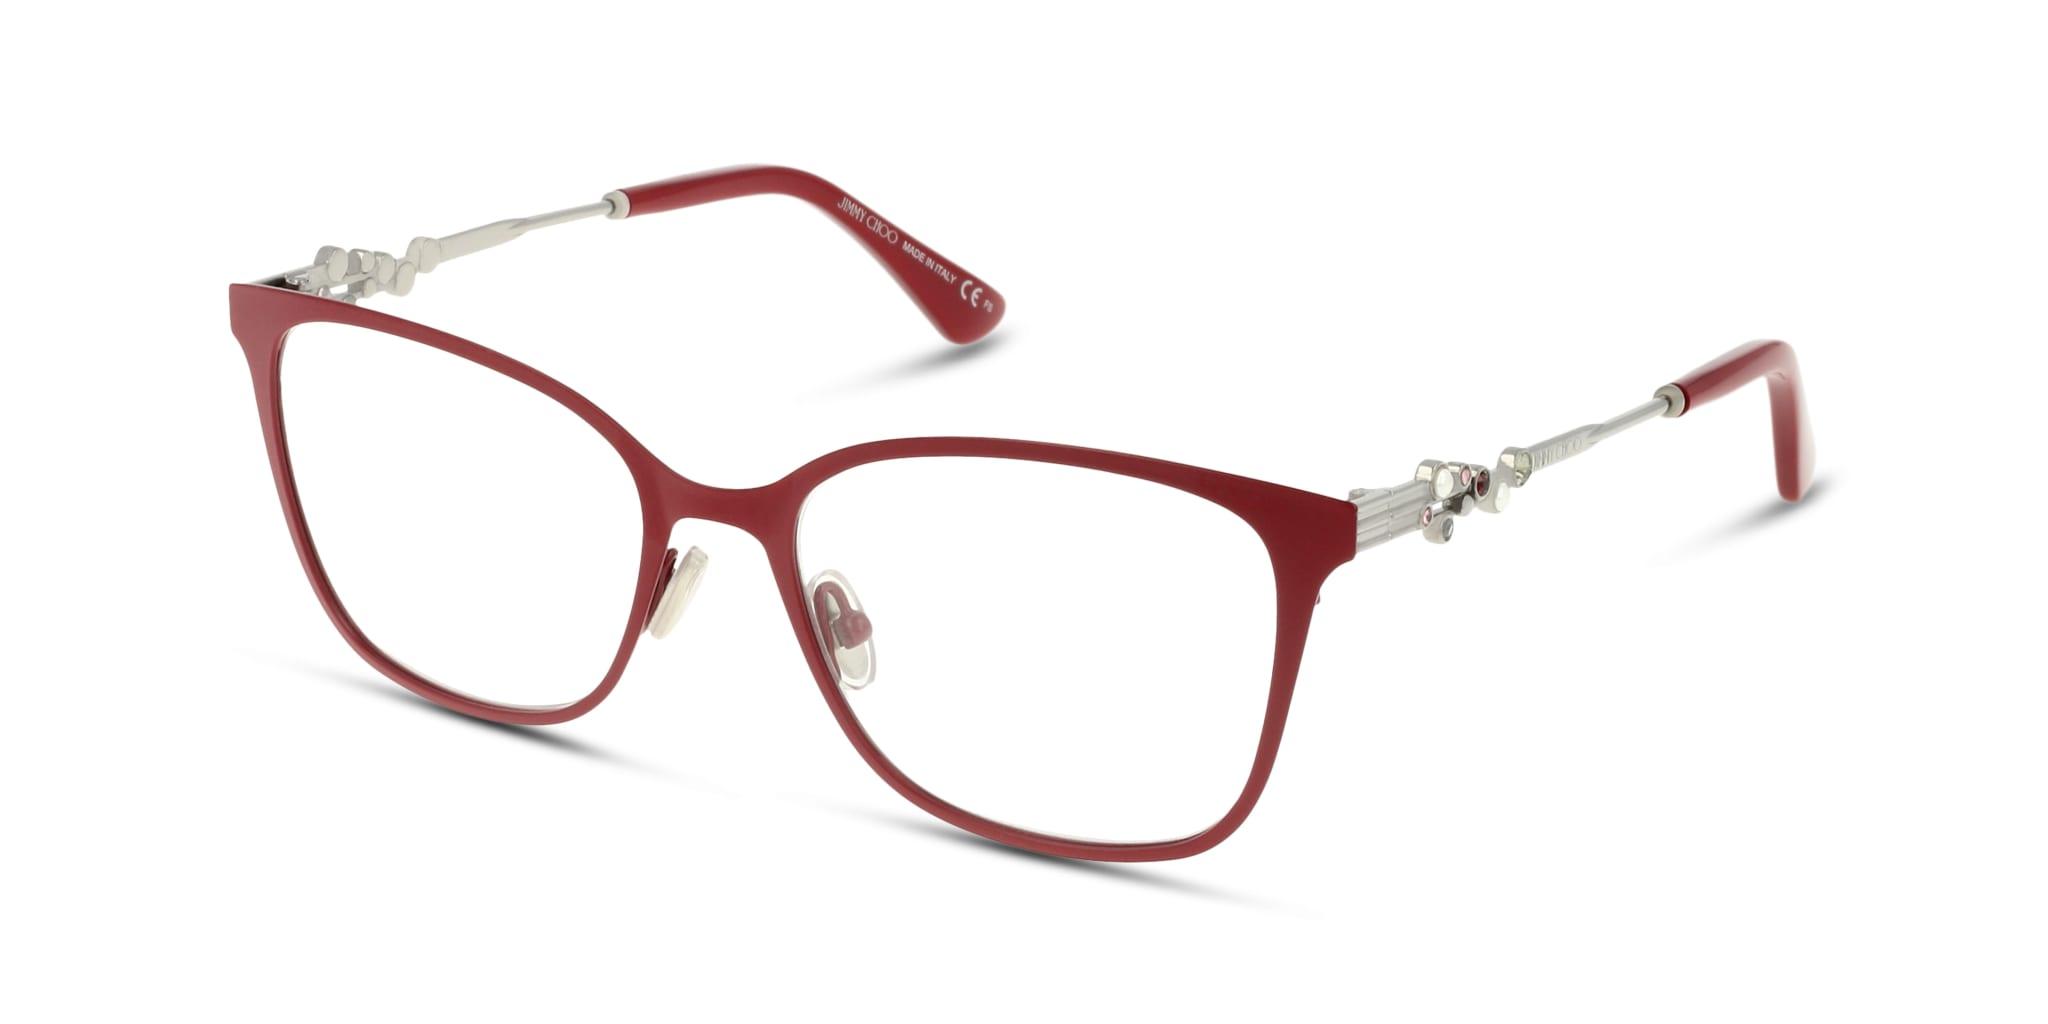 716736070681-angle-03-jimmy-choo-jc212-Eyewear-ople-burg